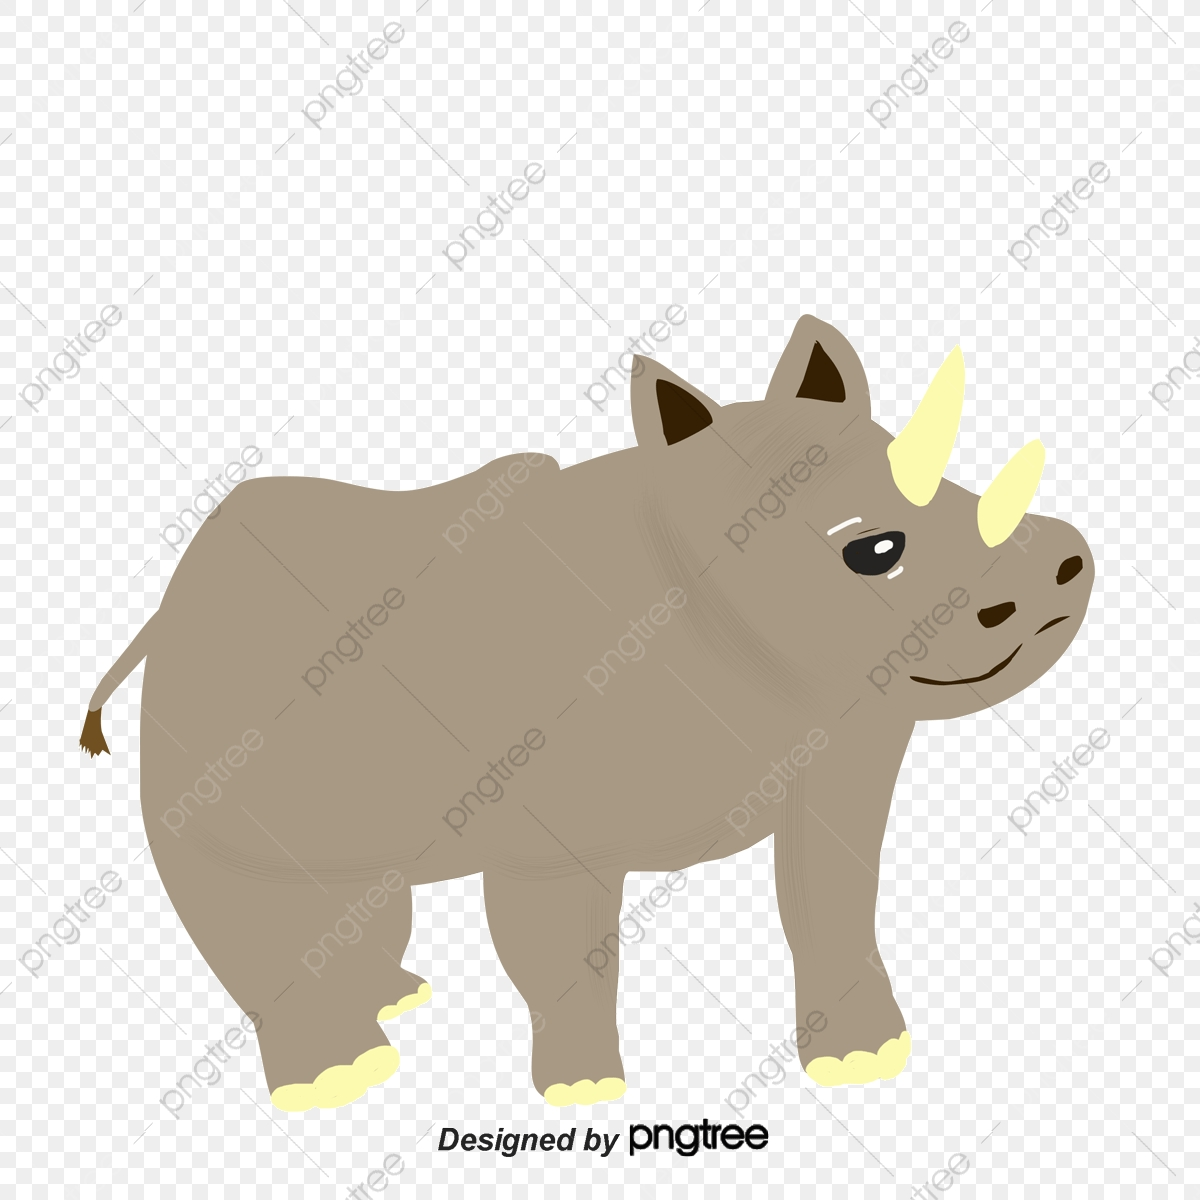 Bulky Hand Painted Cartoon Rhino, Cartoon Animals, Hand